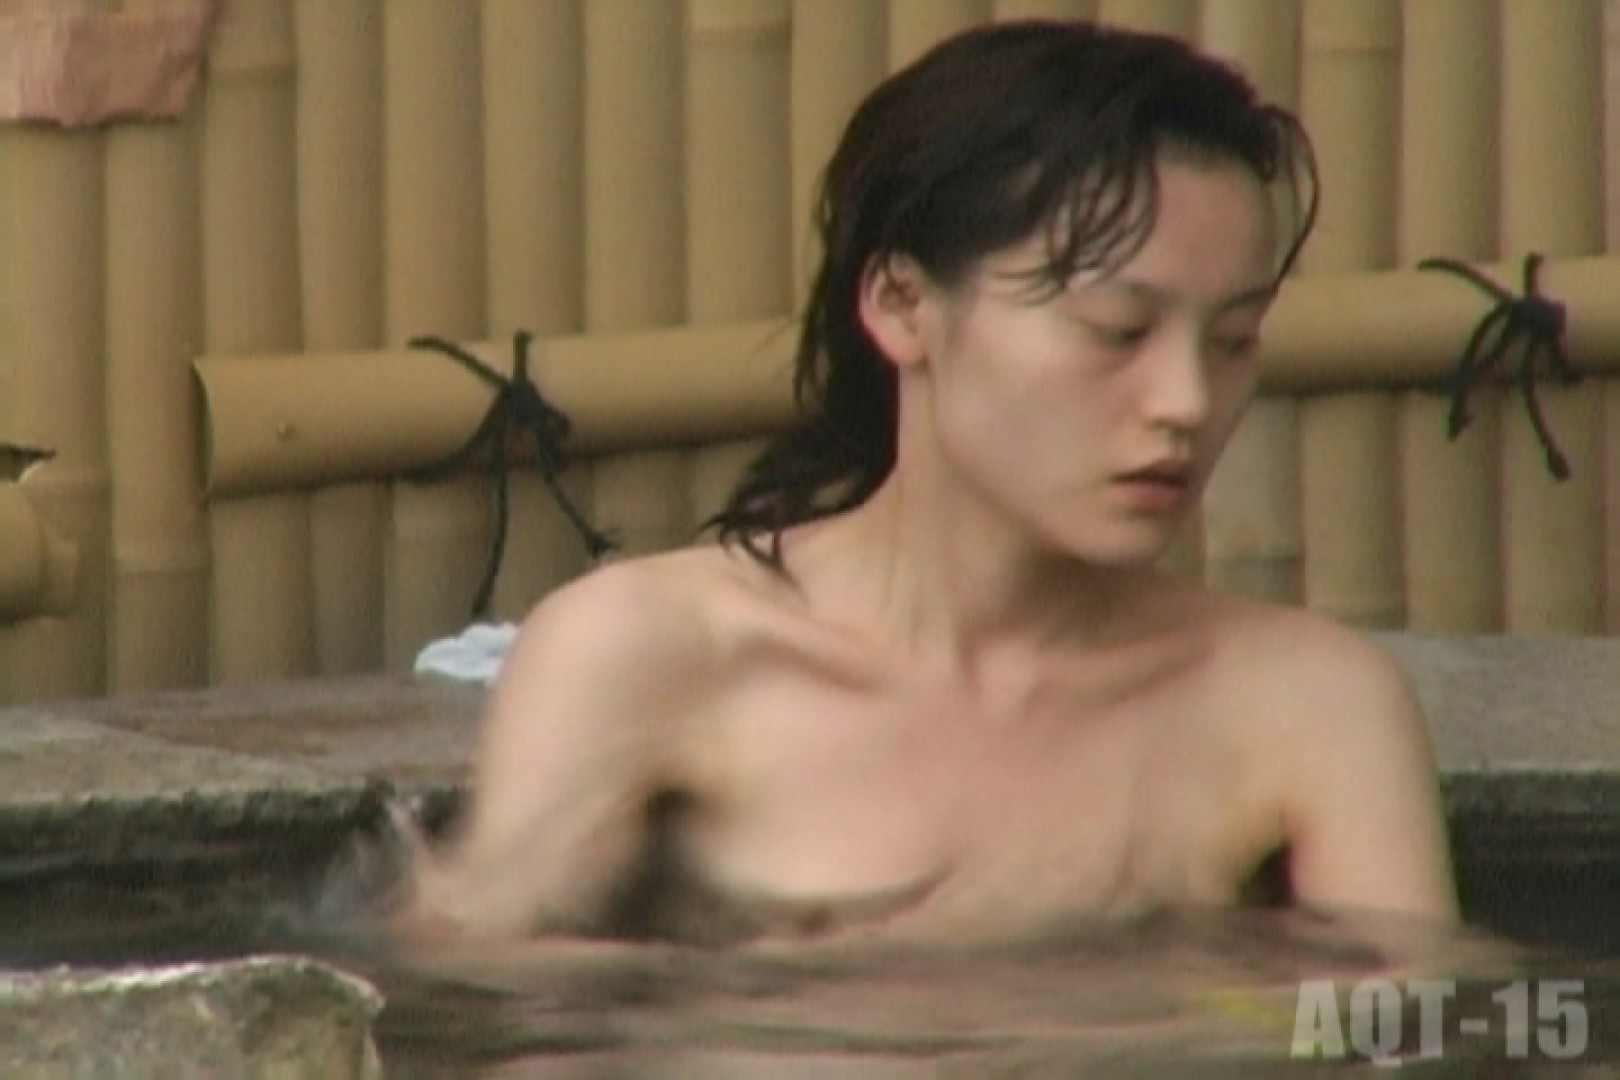 Aquaな露天風呂Vol.836 女体盗撮 盗撮アダルト動画キャプチャ 98連発 89